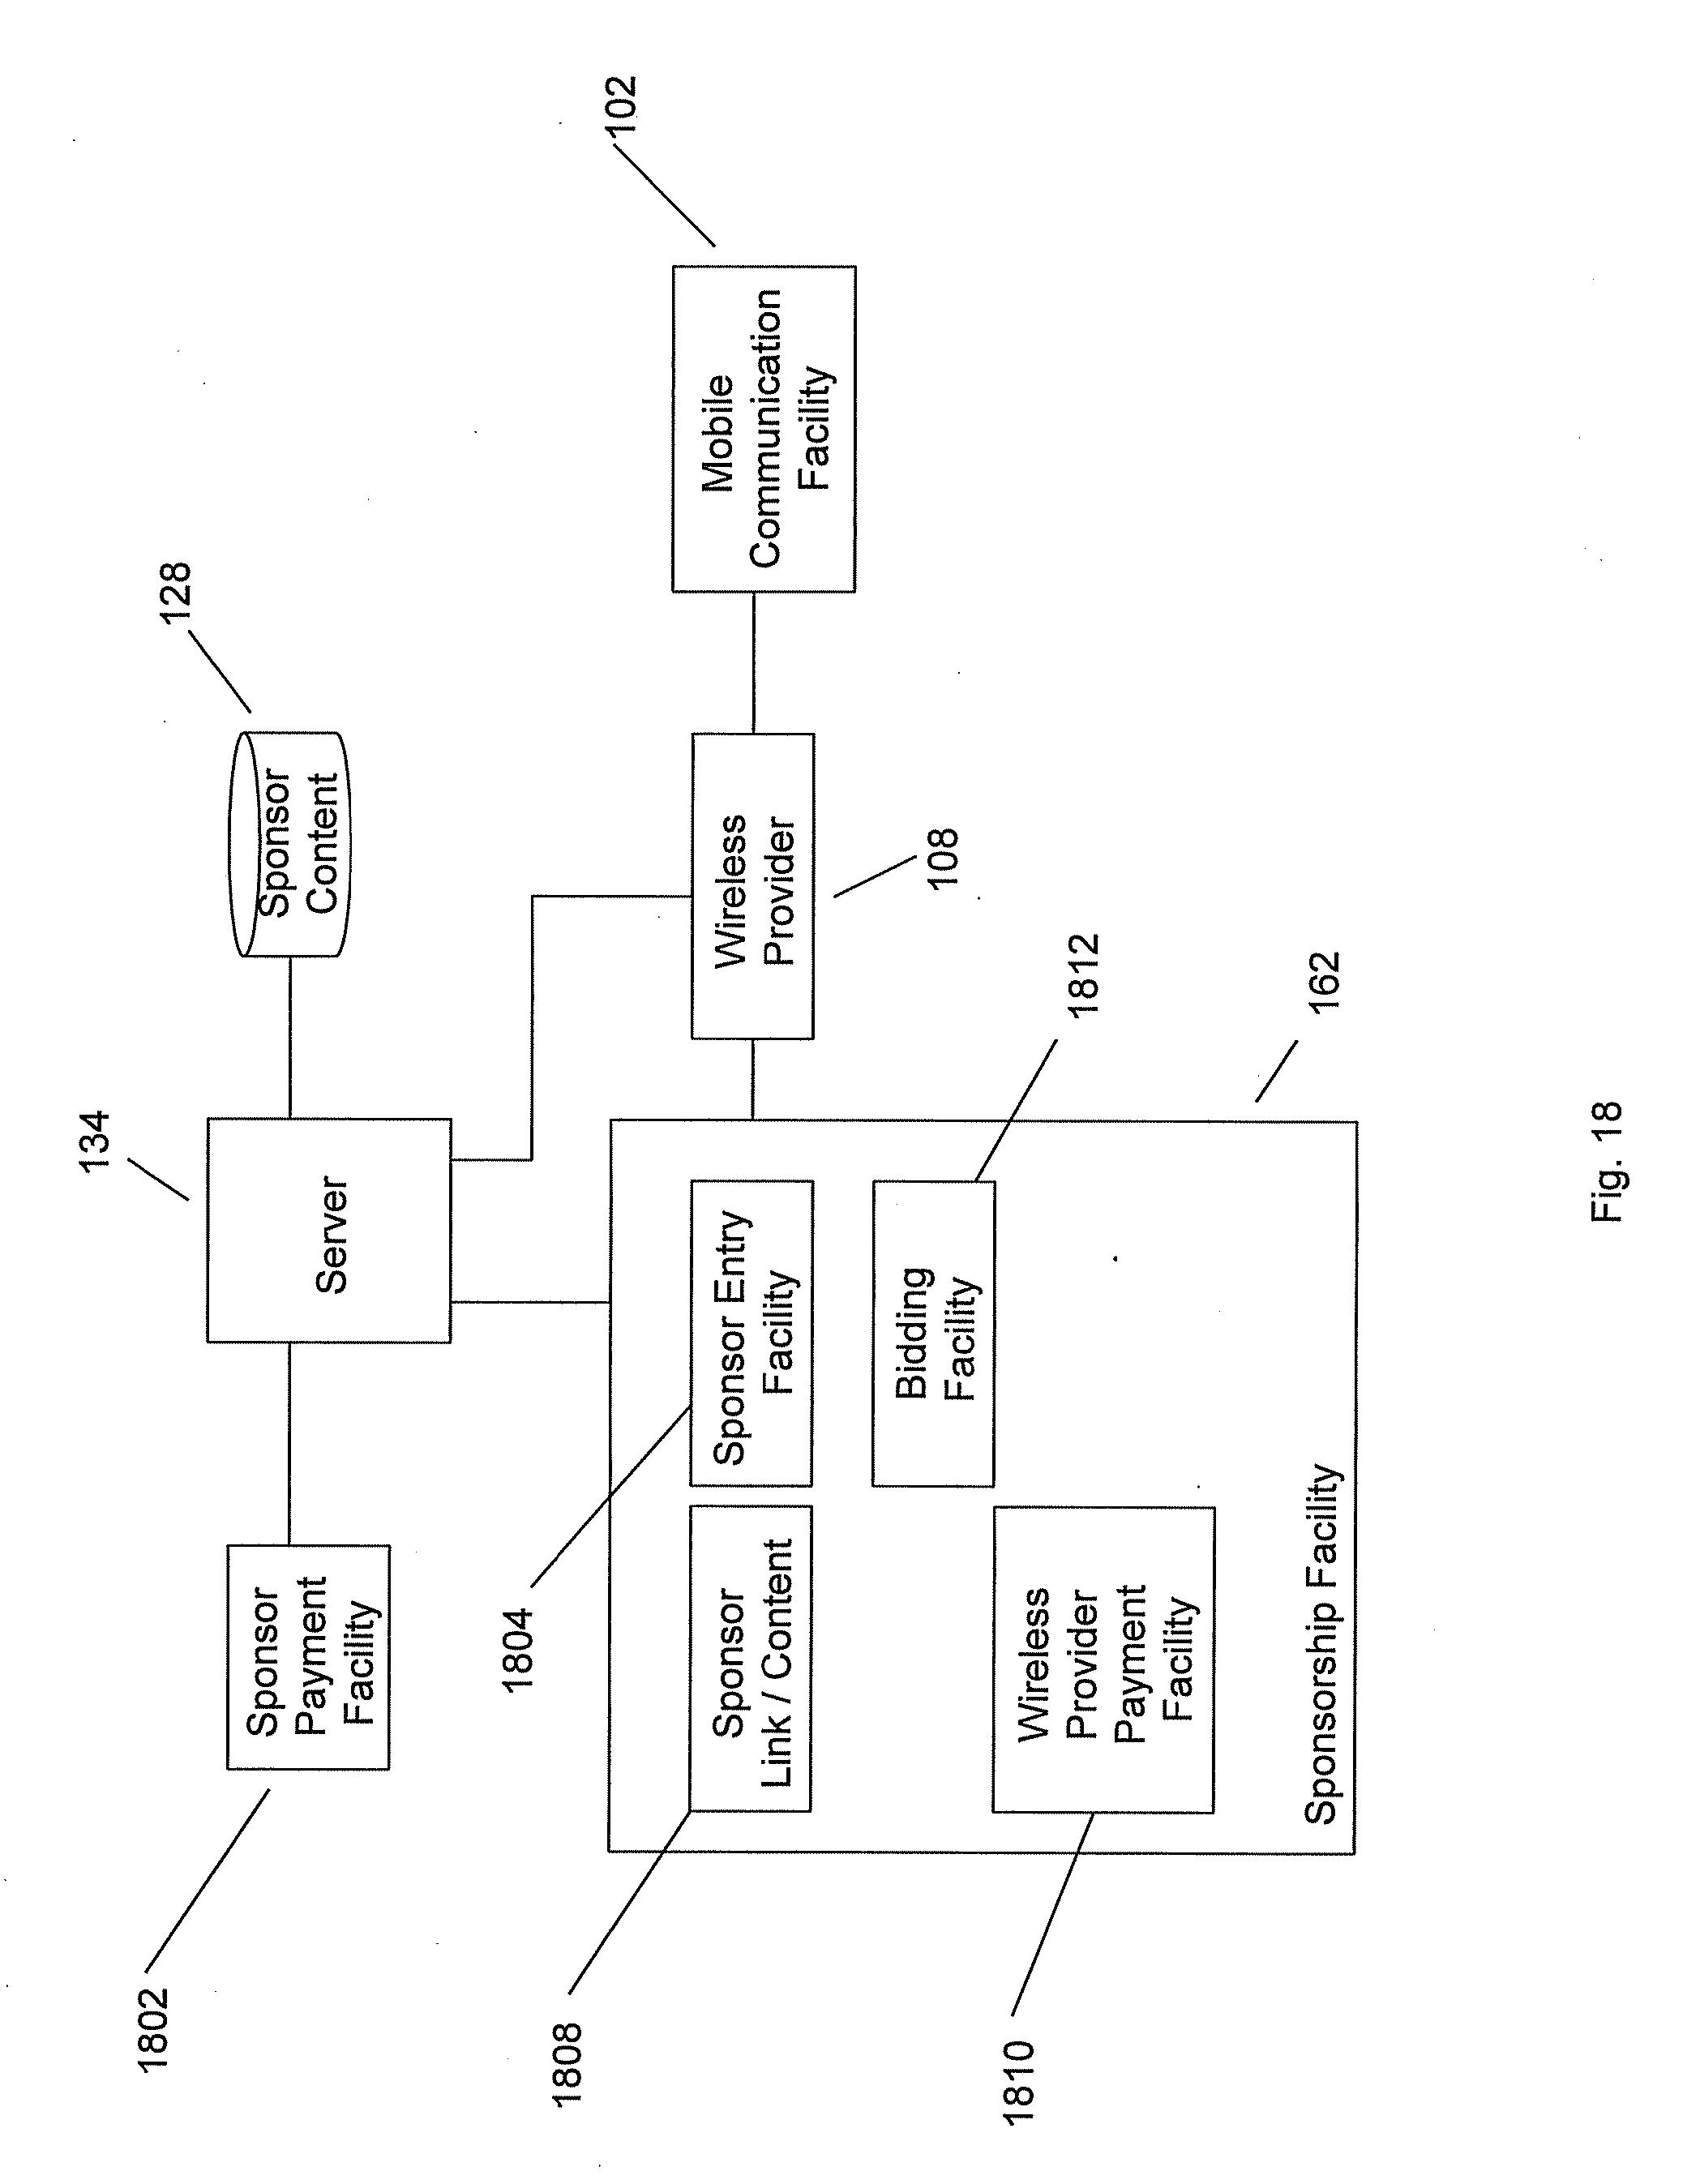 Thread Custom Guitar Special Wiring Diagram Needs Verification